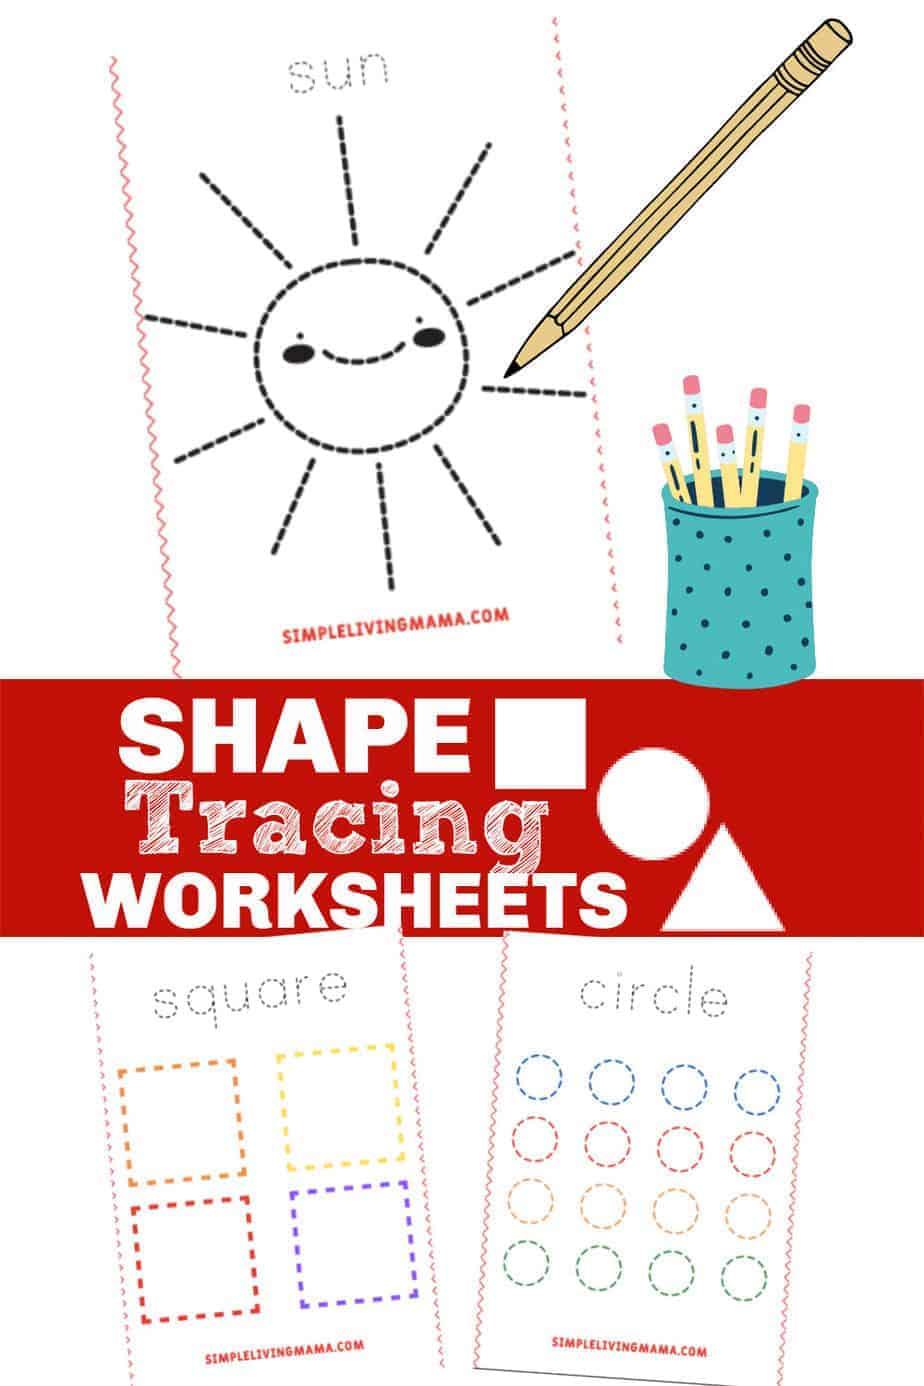 Printable Shape Tracing Worksheets for Preschool and Kindergarten